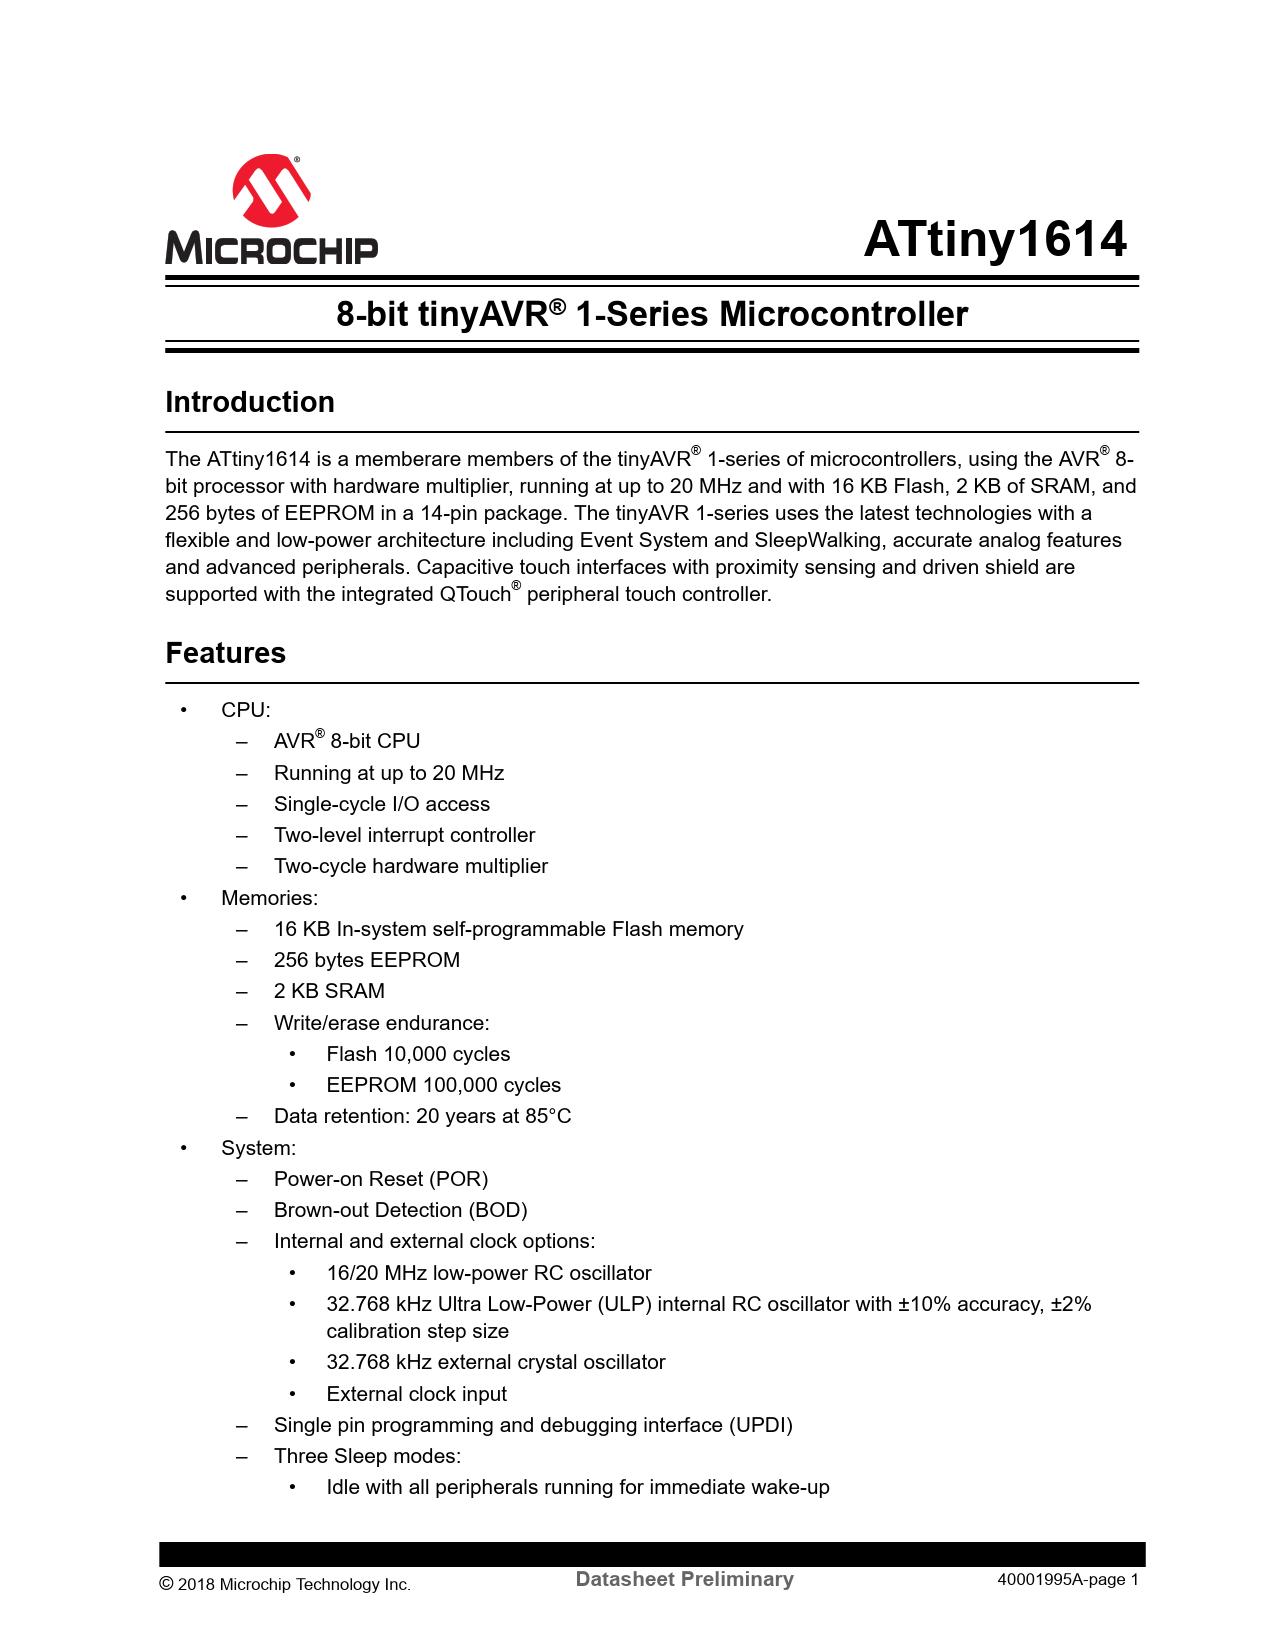 Datasheet ATtiny1614 Microchip